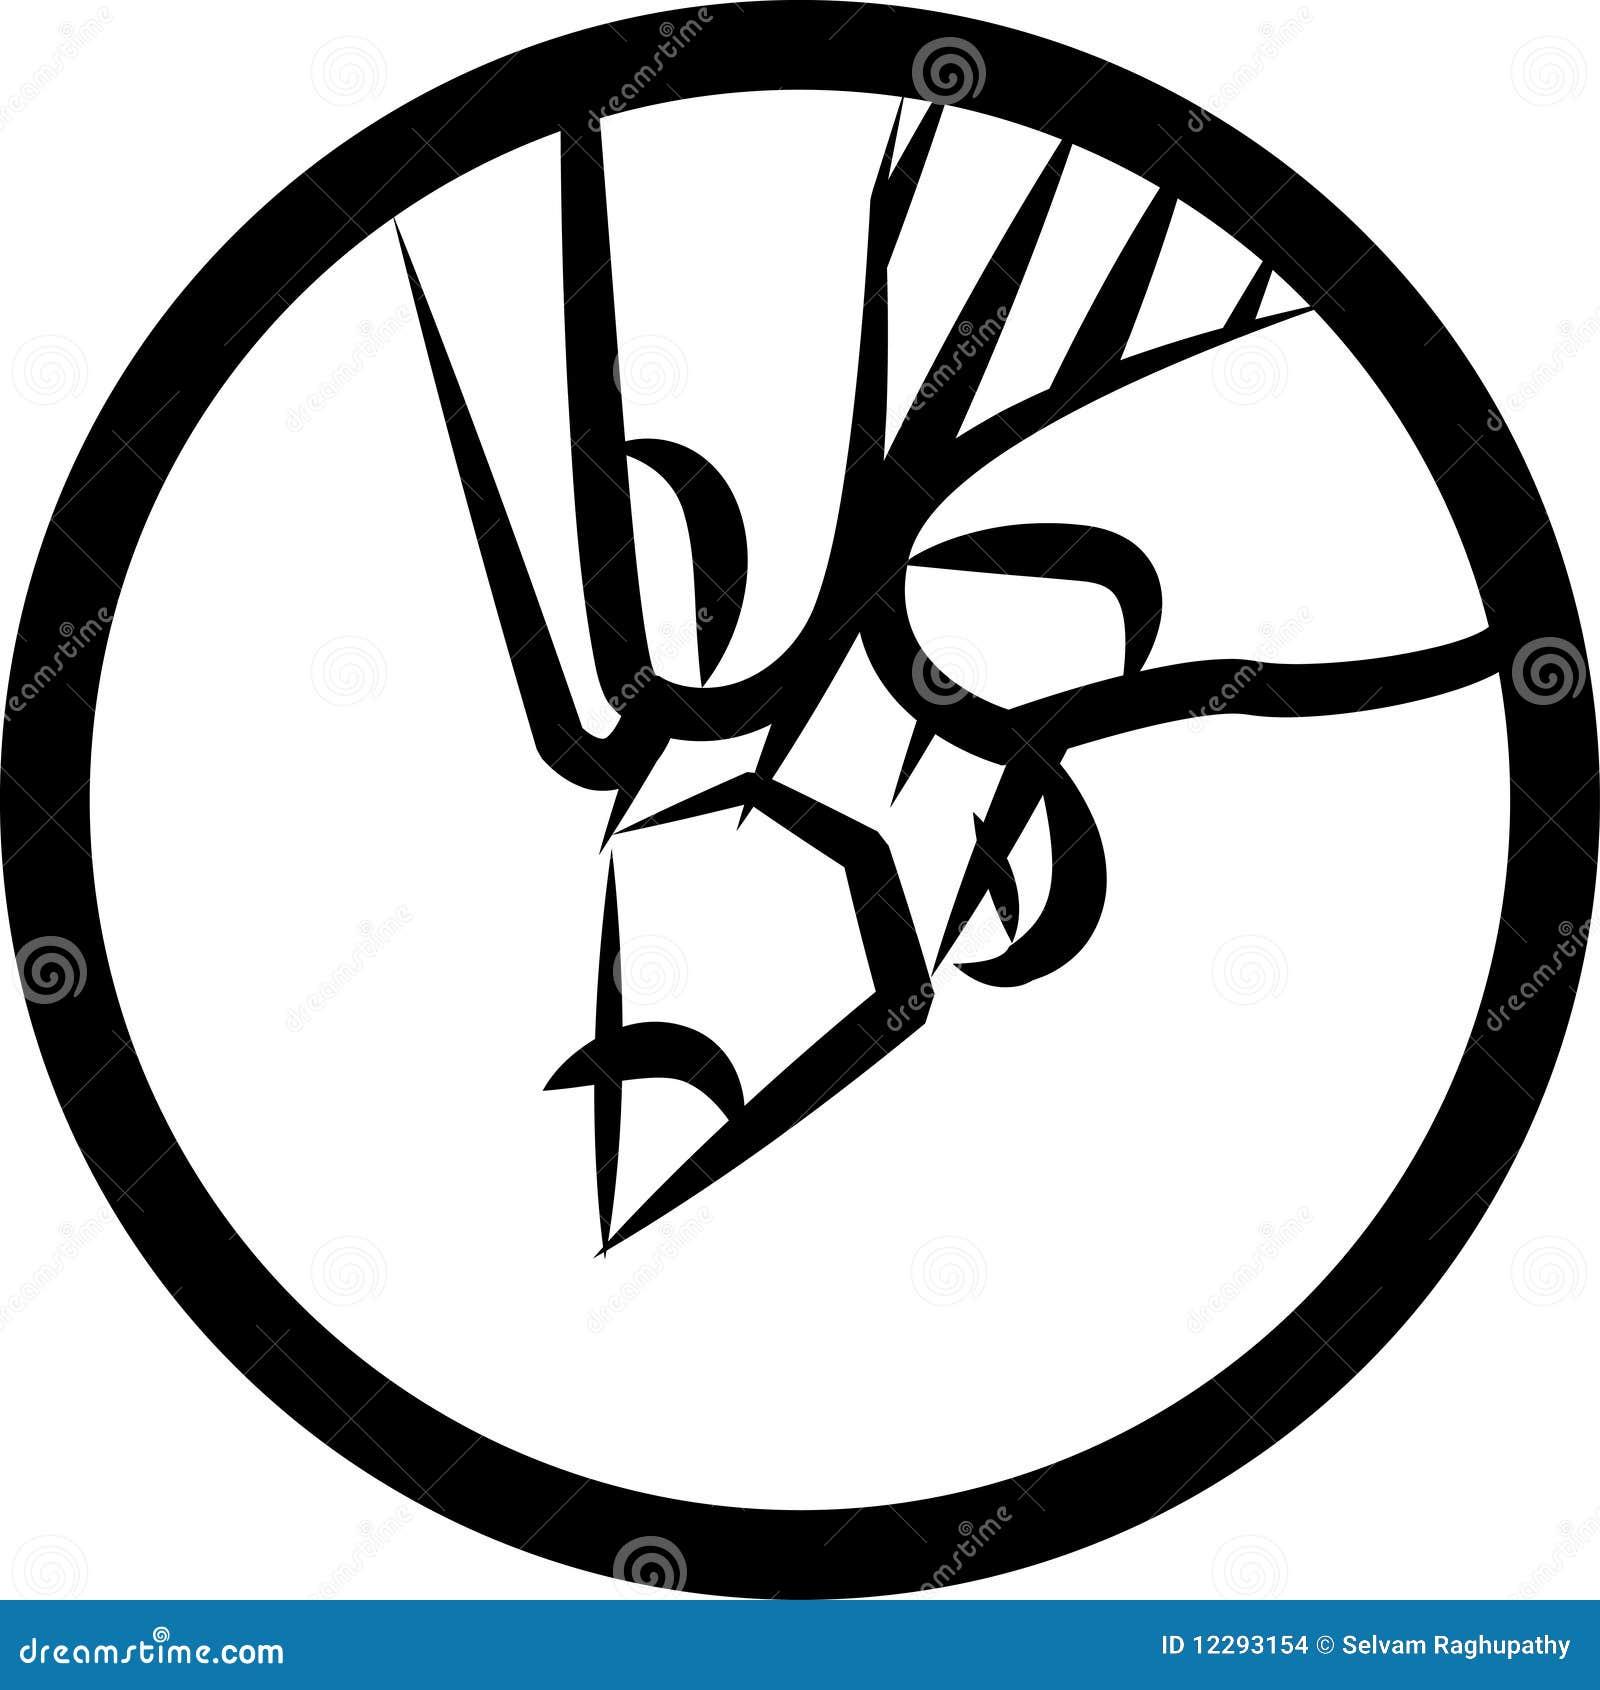 drawing logo stock vector illustration of logo fingers 12293154